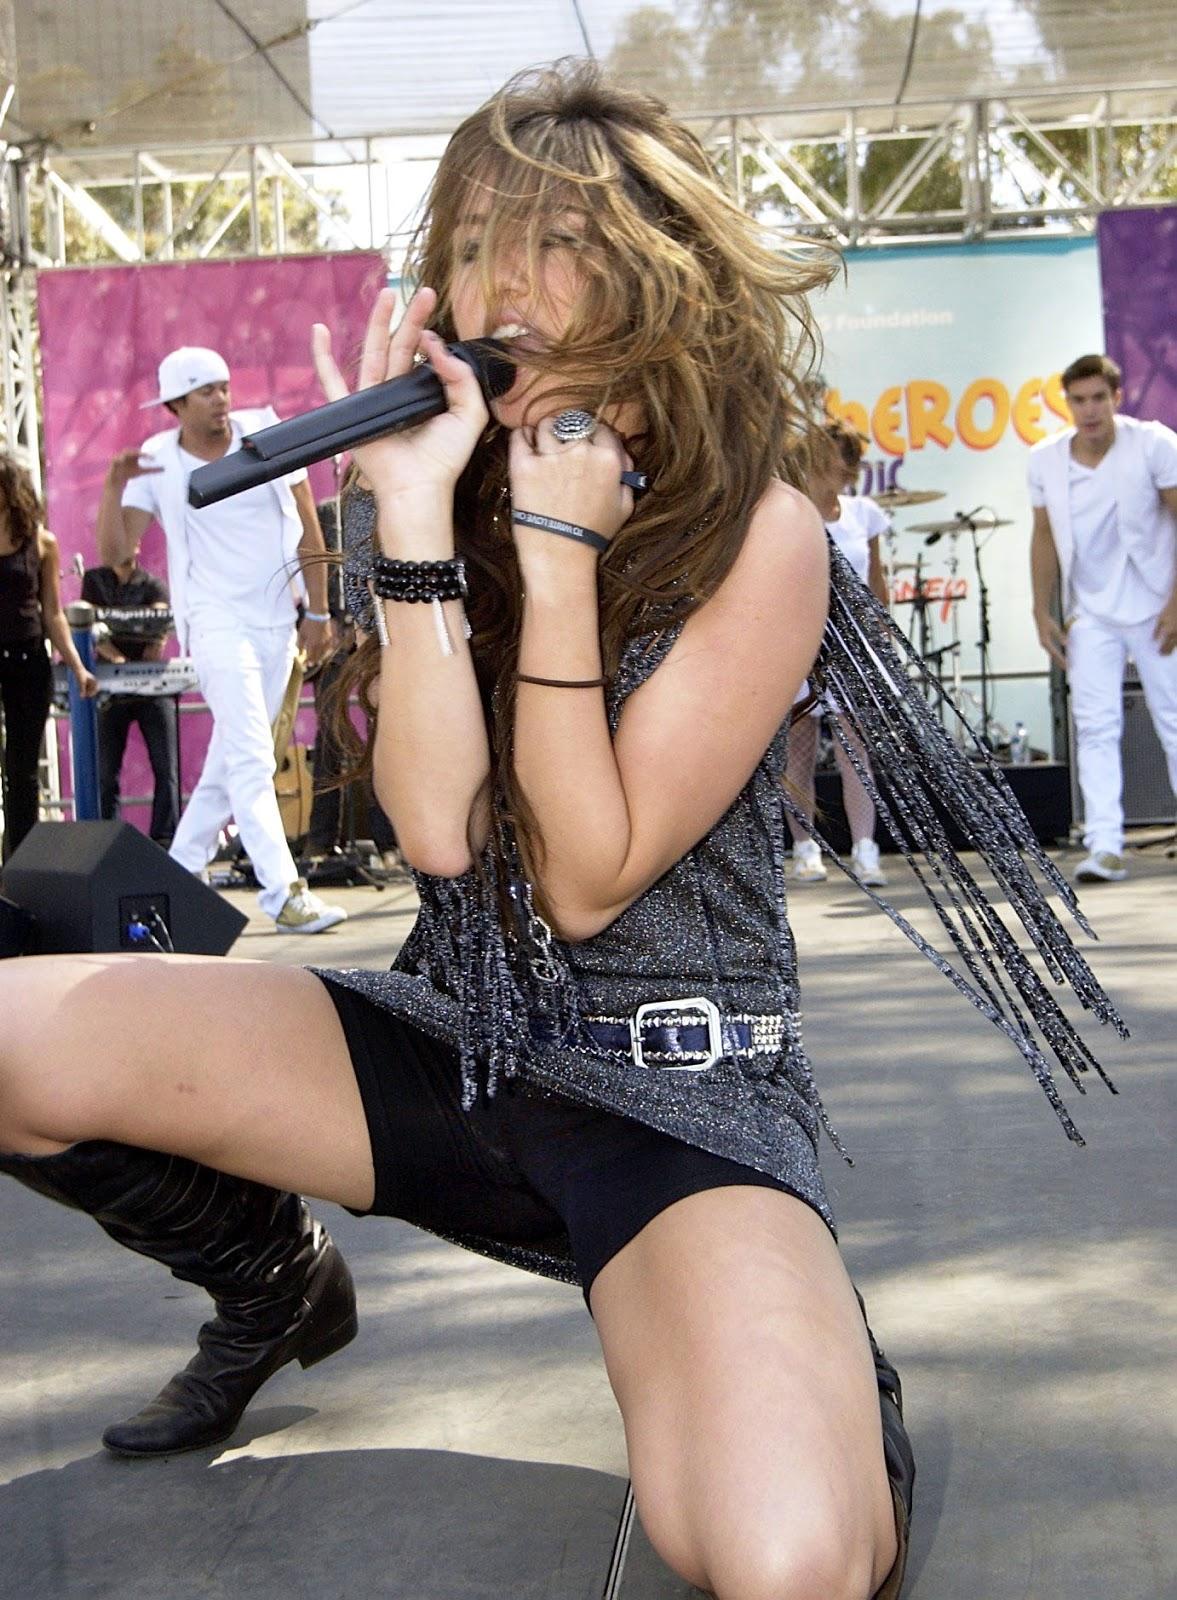 Miley cyrus uncensored upskirt pic